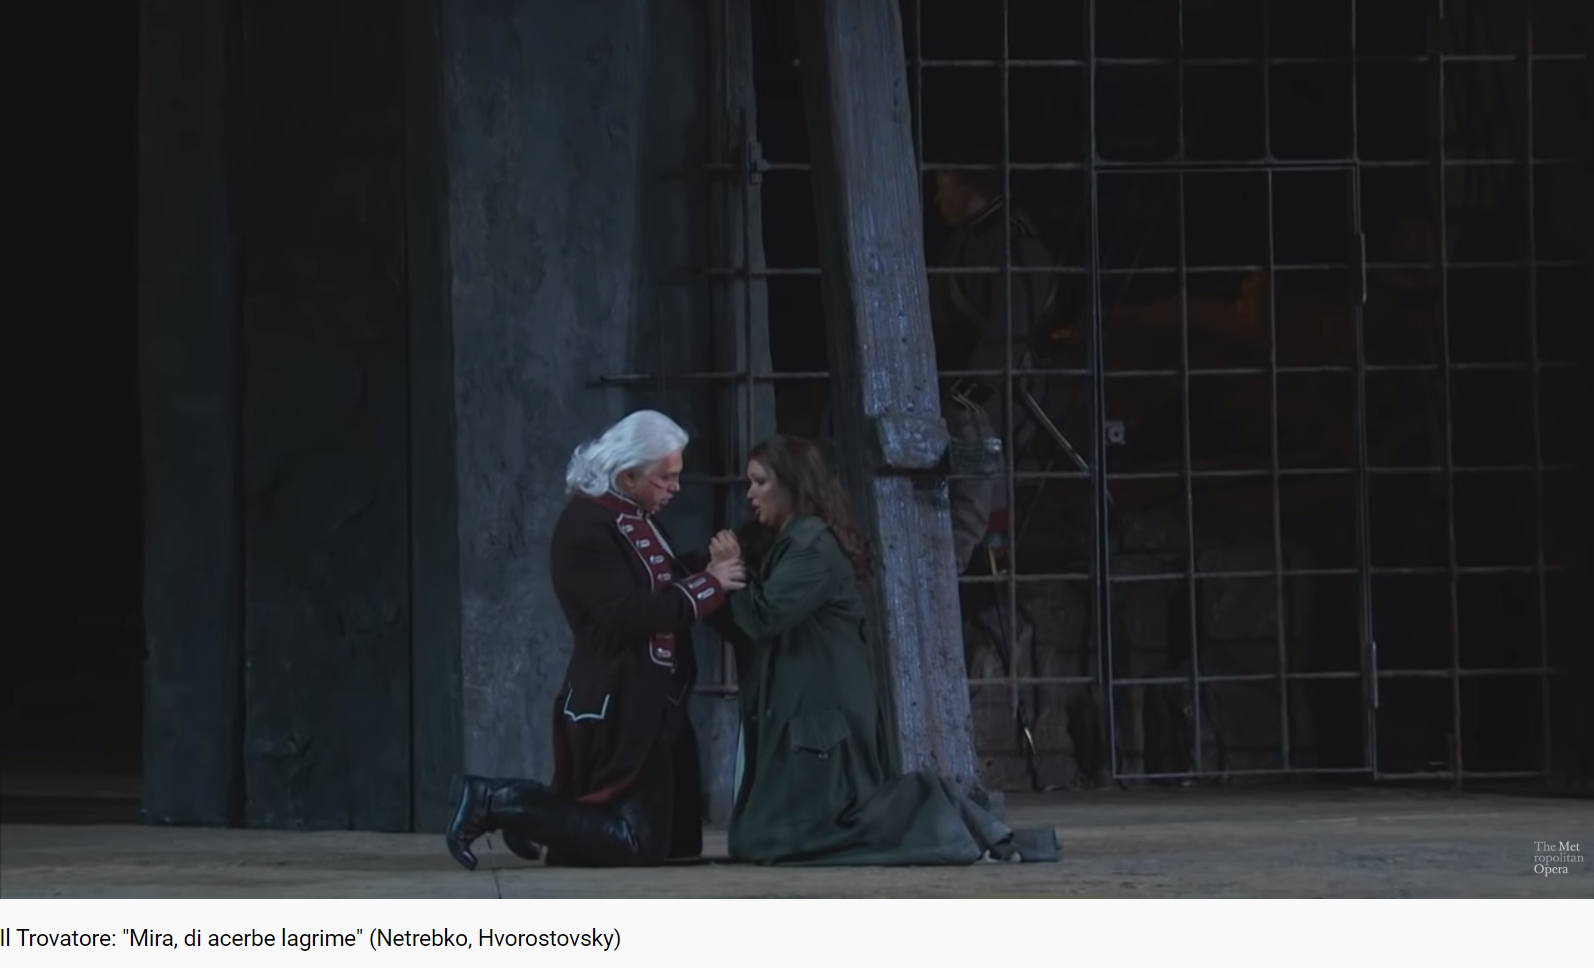 Verdi Il Trovatore Mira, di acerbe lagrime (Met 2015)